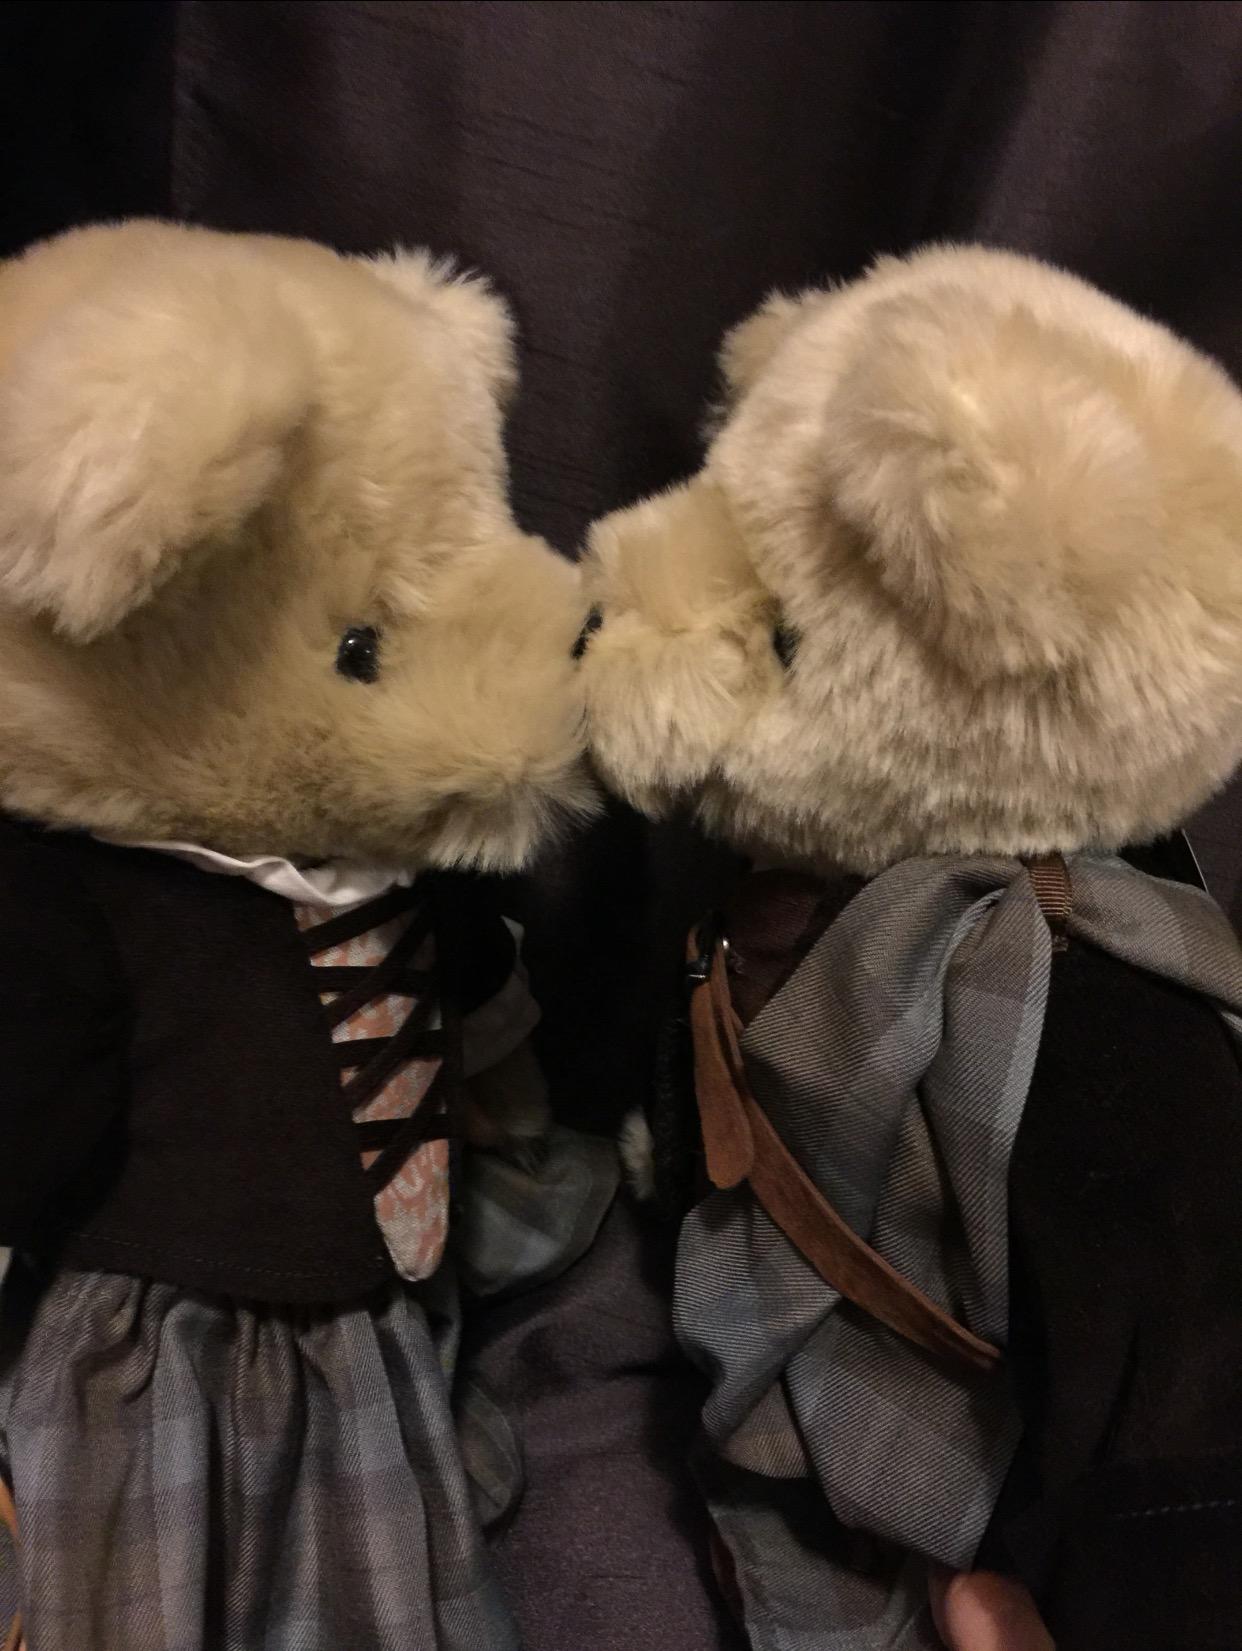 Those gorgeous 'Outlander' bears